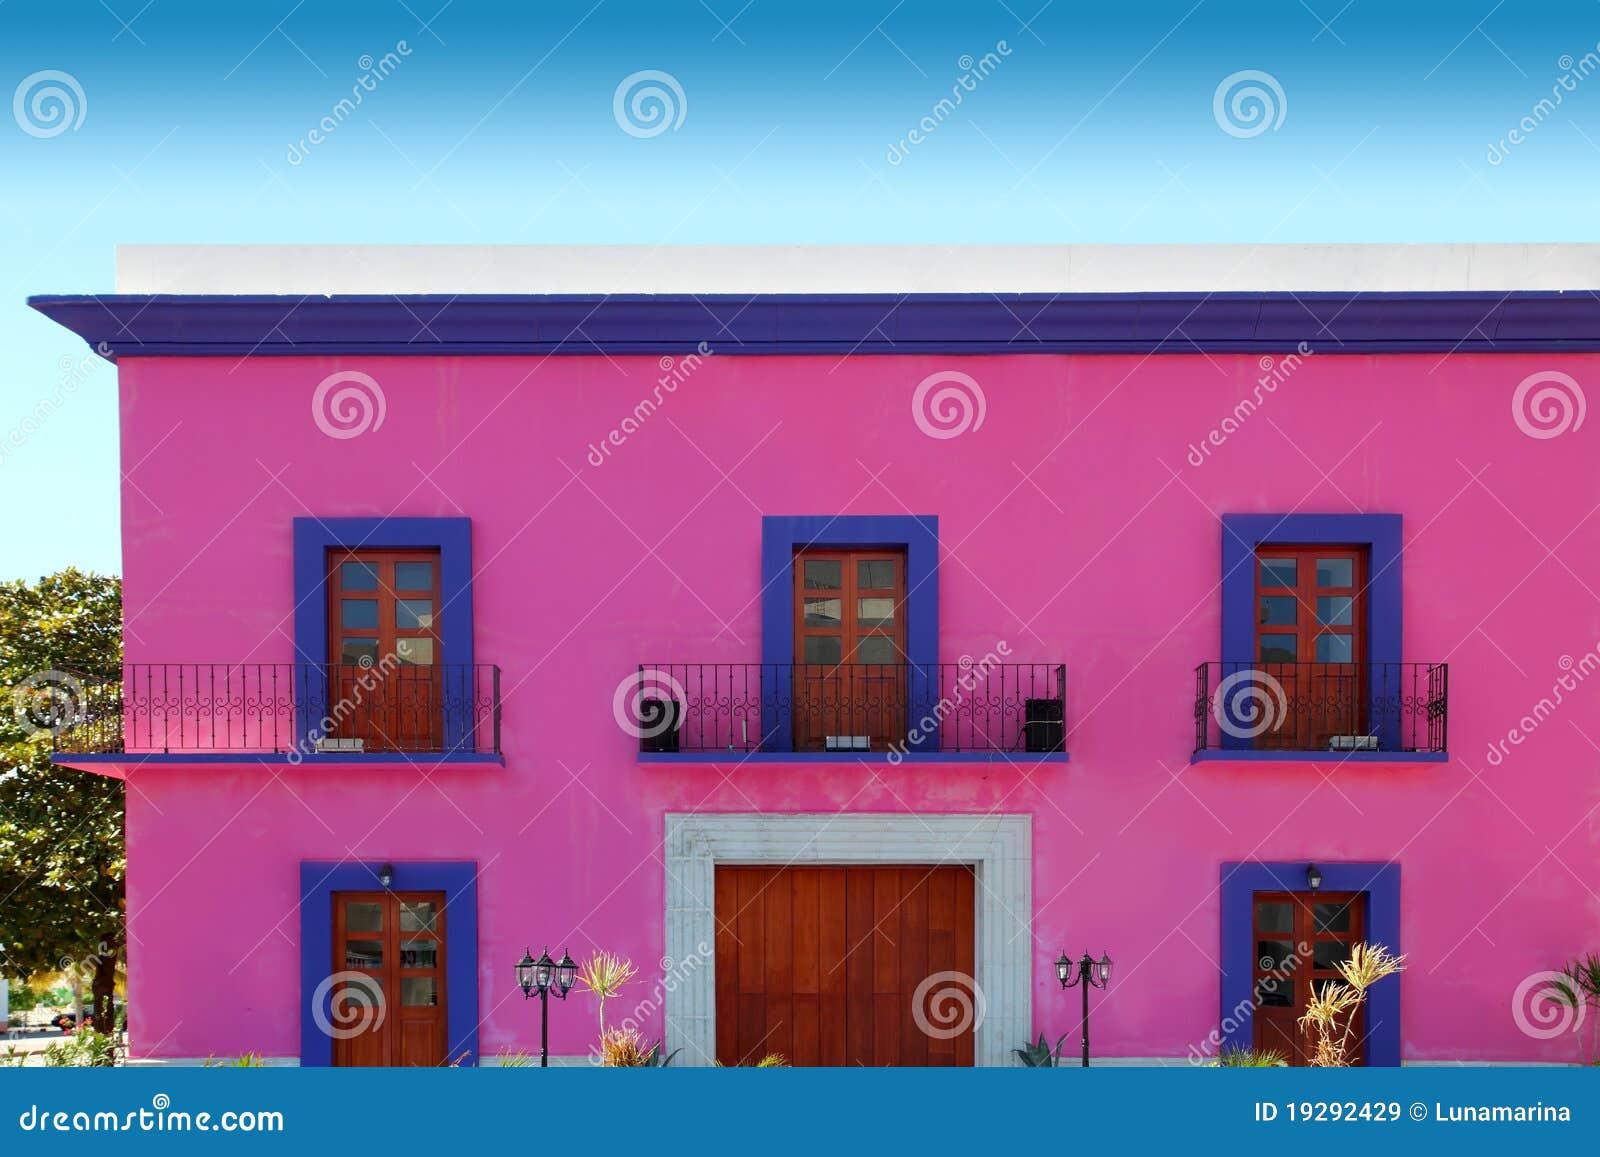 Portas De Madeira Da Fachada Cor-de-rosa Mexicana Da Casa Imagens de ...